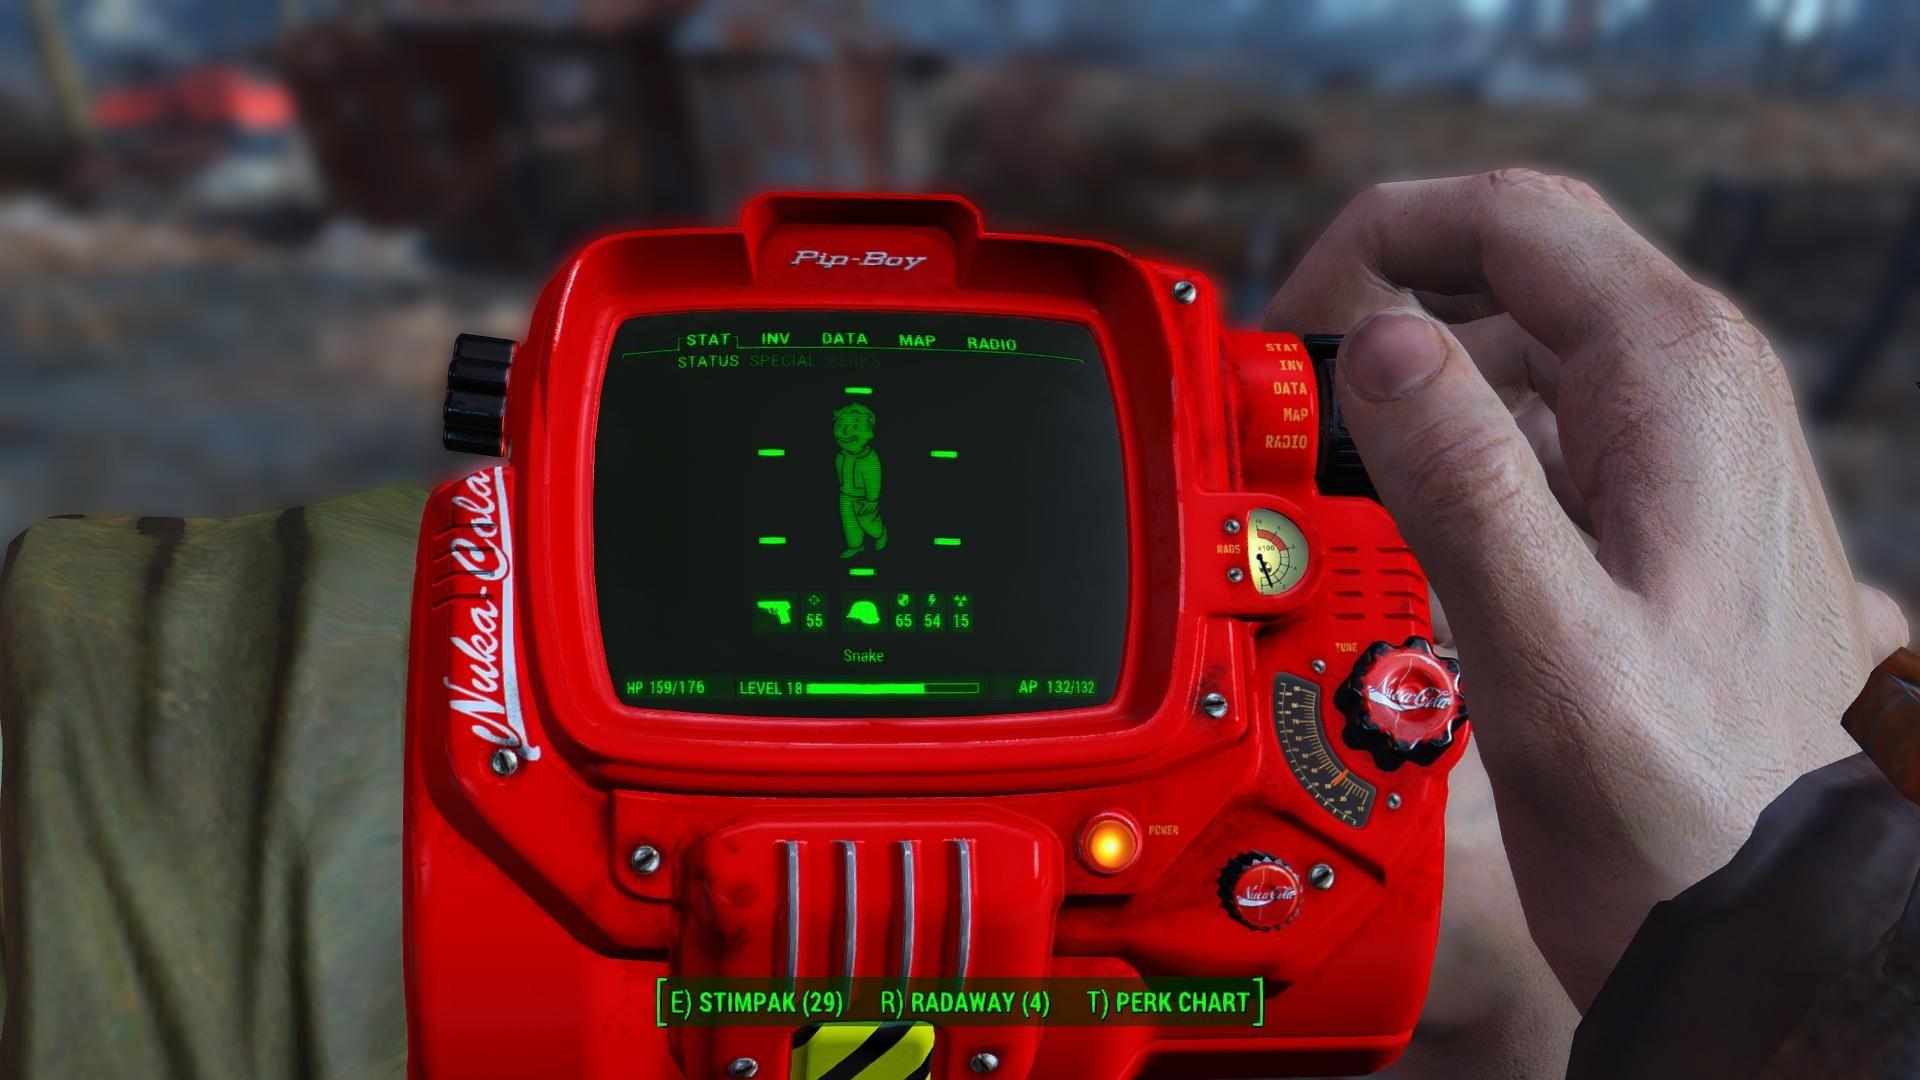 Nuka-Cola Pip-Boy Fallout4